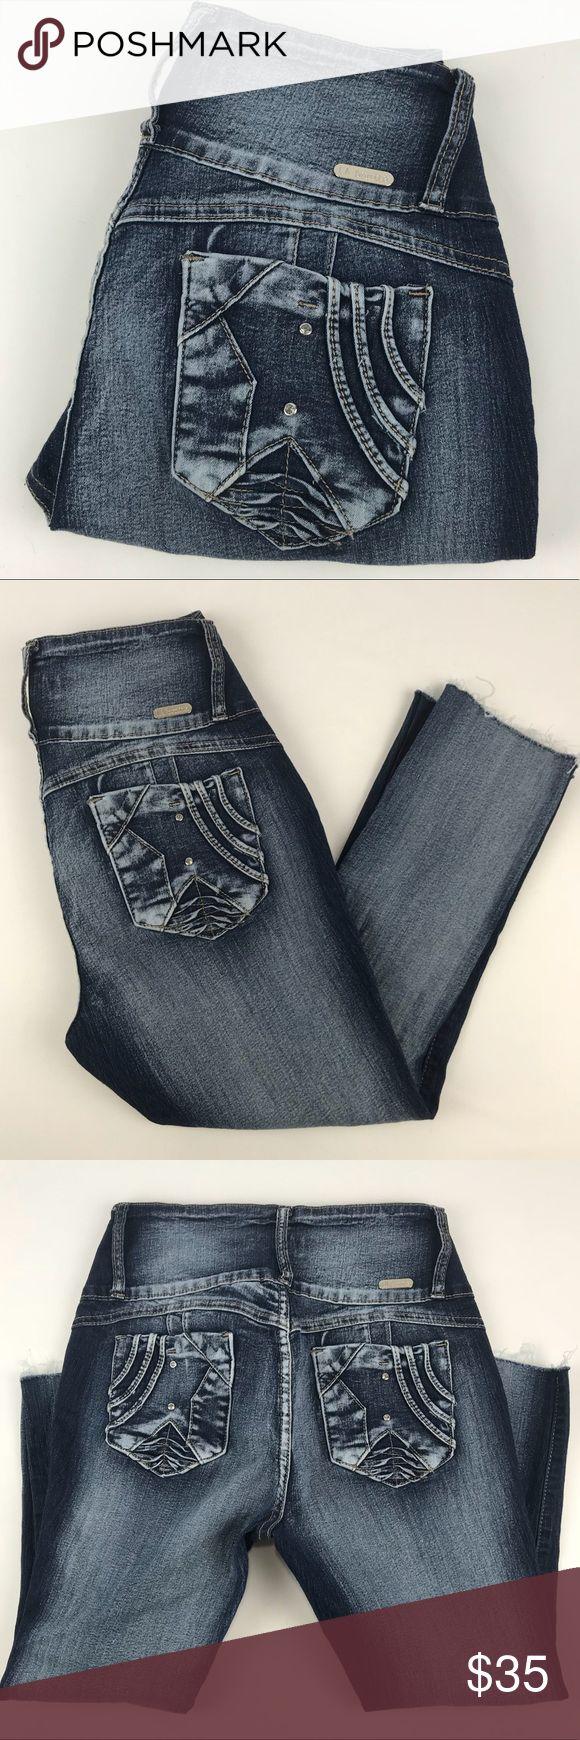 "La Bonita  Capri Hi rise Skinny cut off jeans La Bonita Hi Rise Skinny Destry wash jeans Cut to around mid calf depending on your height  4 Rhinestone Button fly with zipper closure Designed back pocket Mock front pockets   Waist 16"" Stretch to 18"" Rise 10"" Inseam 22"" Leg 6.5""   G138 La Bonita Jeans Ankle & Cropped"